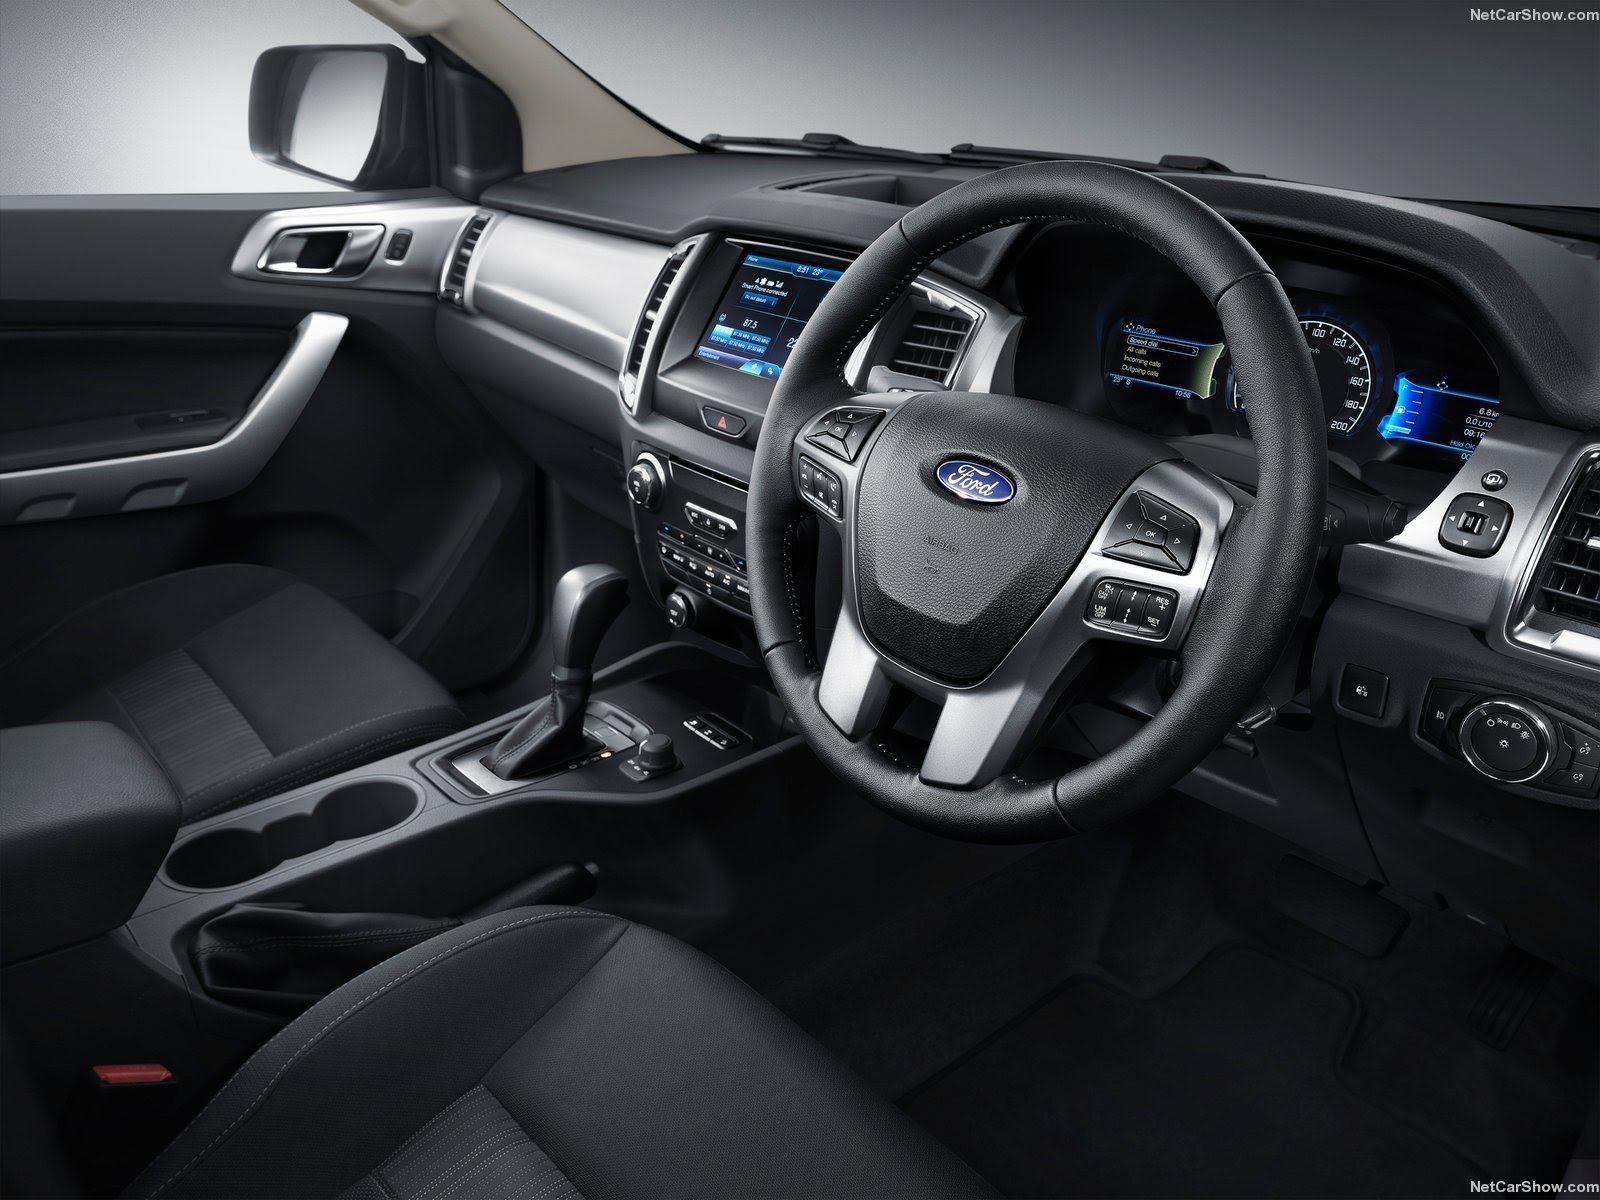 2016 Ford Ranger 3 2 Liter Duratorq 5 Cylinder Tdci Diesel Engine Ford Ranger Ford Ranger Interior Ford Ranger Pickup